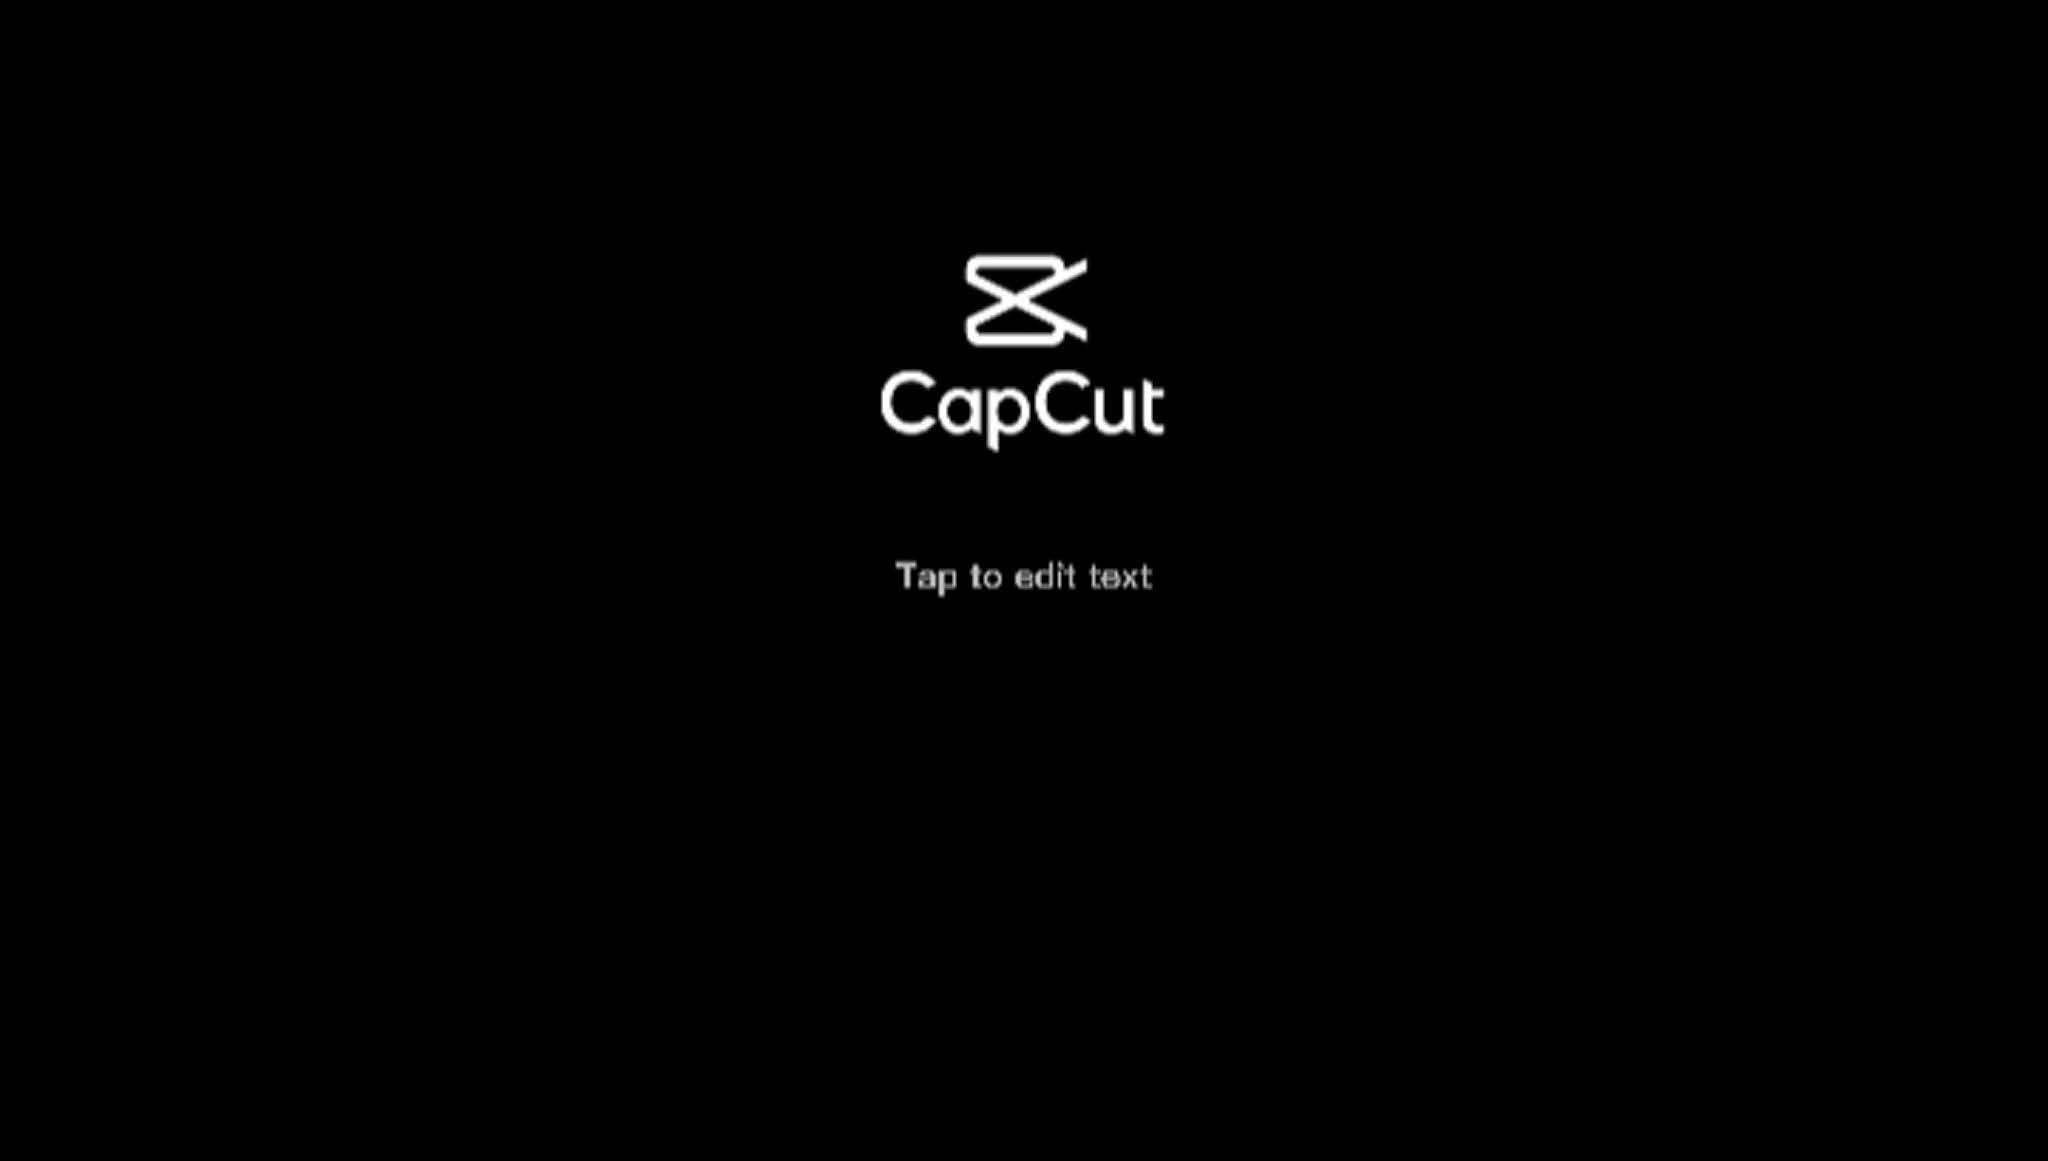 how to remove capcut watermark